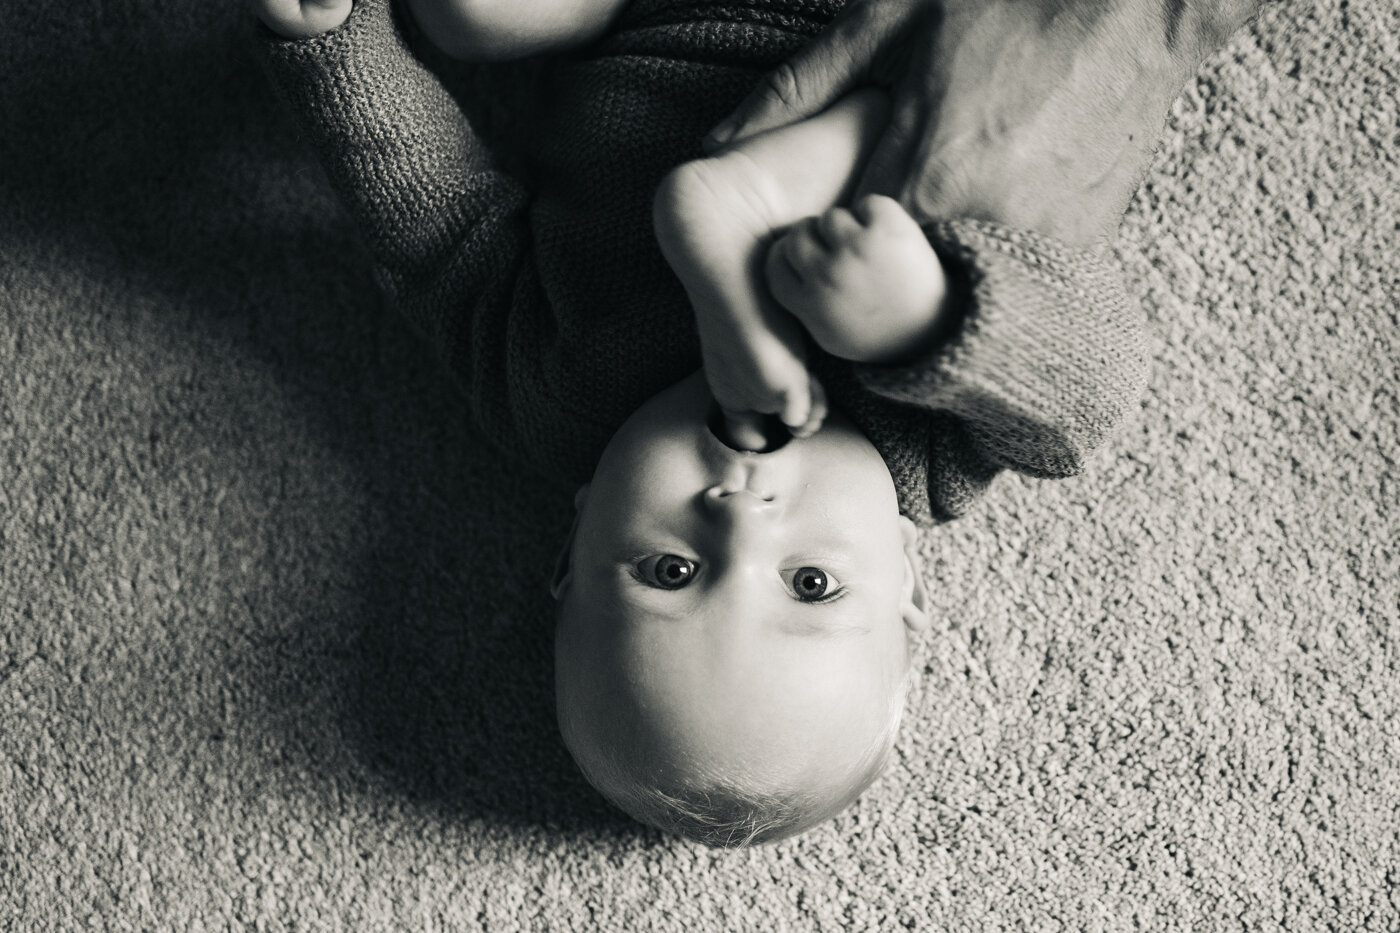 family-photography-teesside-north-yorkshire-newborn-baby-family-shoot-0010.jpg